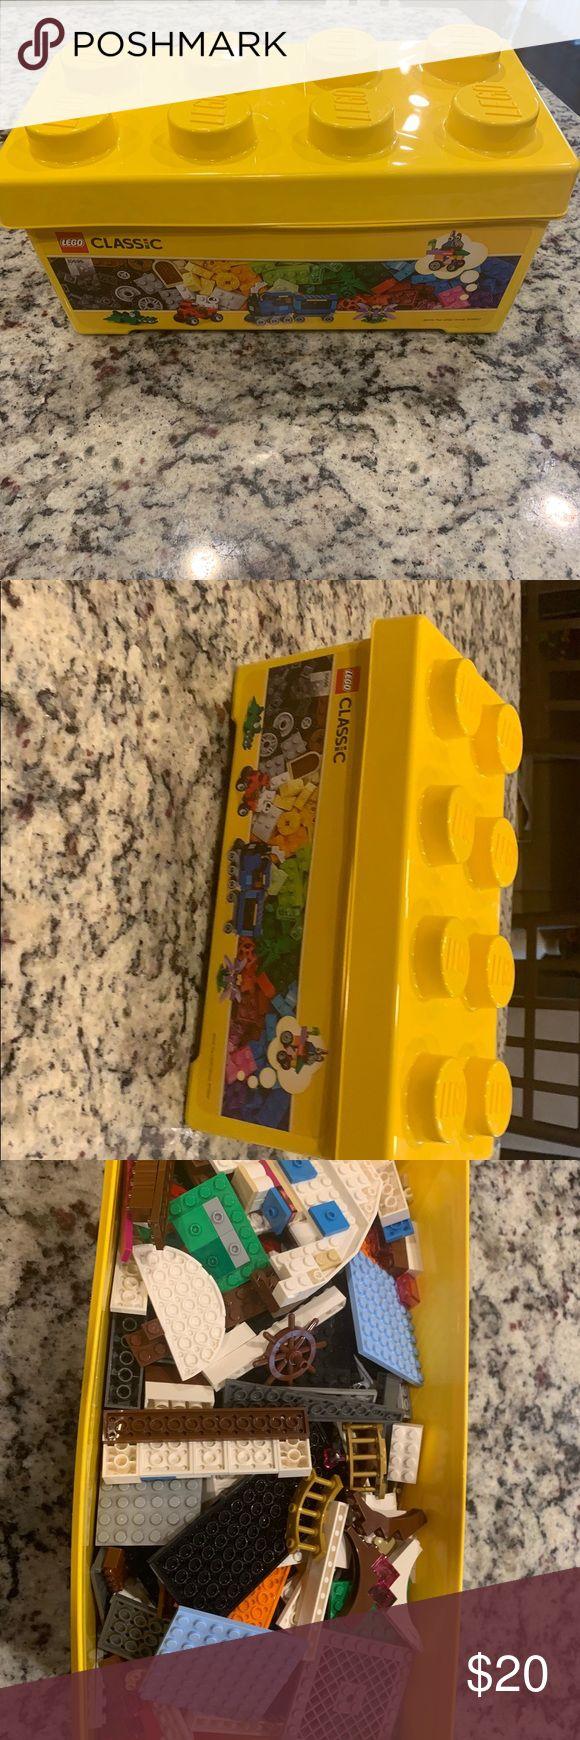 Legos box full 3lbs 15oz Völlig zufällige Menge verschiedener LEGO Teile Lego …   – My Posh Closet